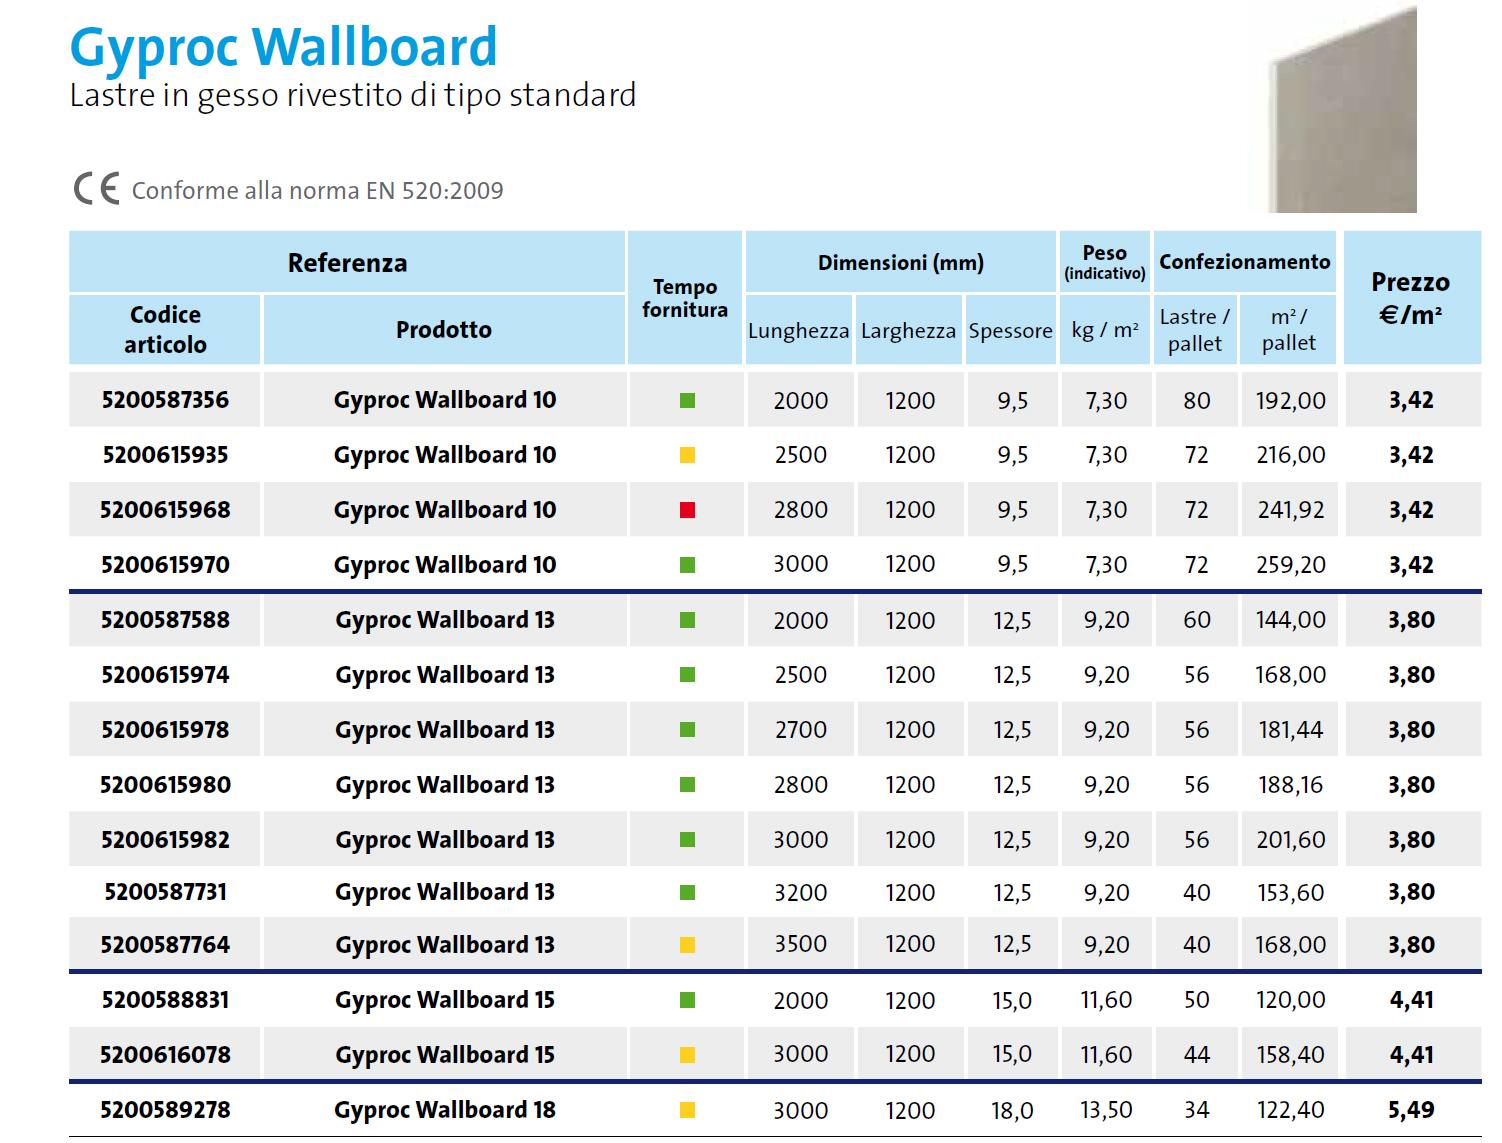 Lastra standard Gyproc Wallboard